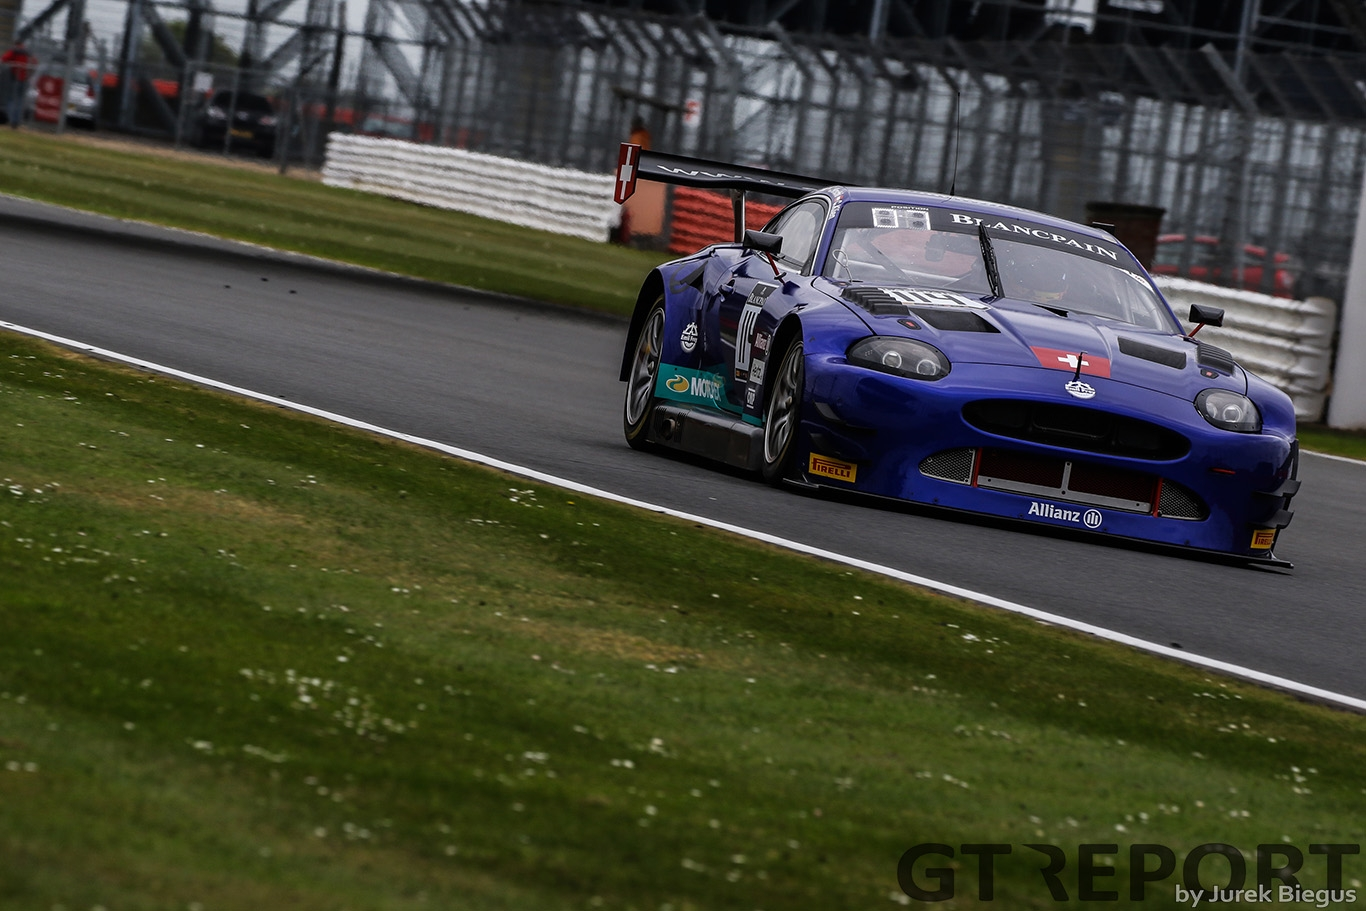 Emil Frey Jaguar Racing | Emil Frey Jaguar G3 | Jonathan Hirschi | Christian Klien | Marco Seefried | Blancpain GT Series Endurance Cup | Silverstone Circuit | 13 May 2017 | Photo by Jurek Biegus.